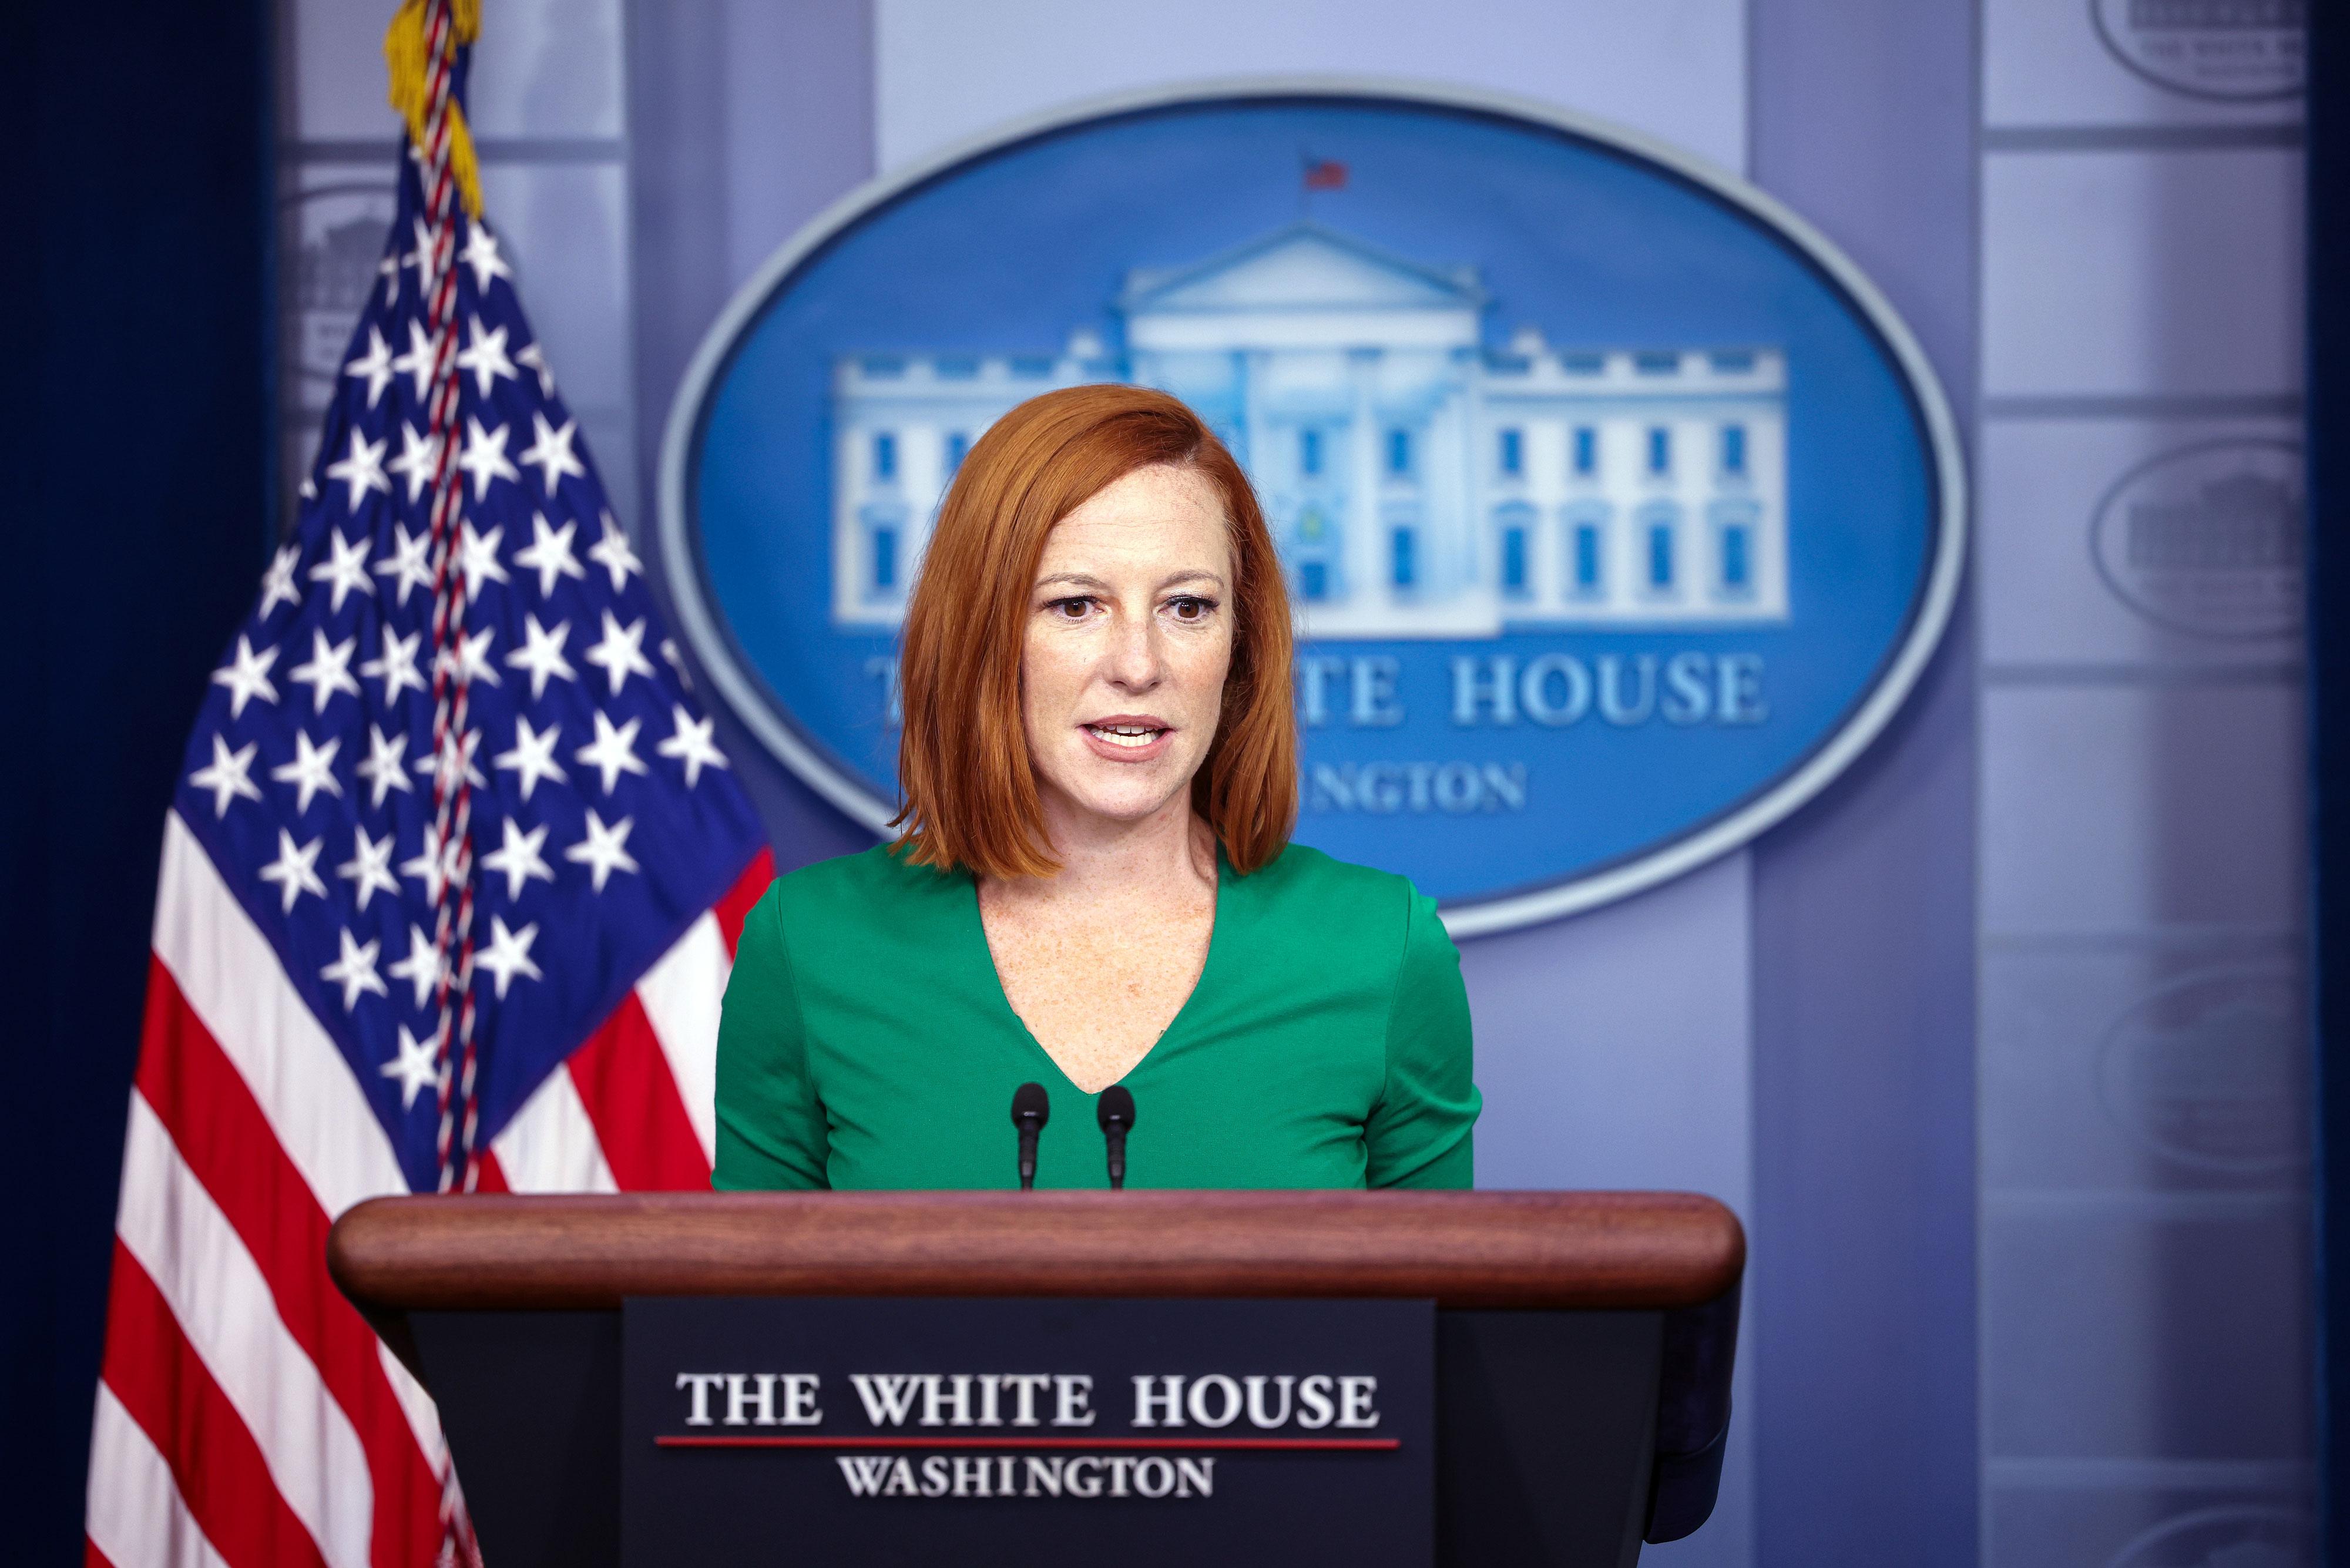 White House press secretary Jen Psaki speaks during a briefing at the White House on September 9.